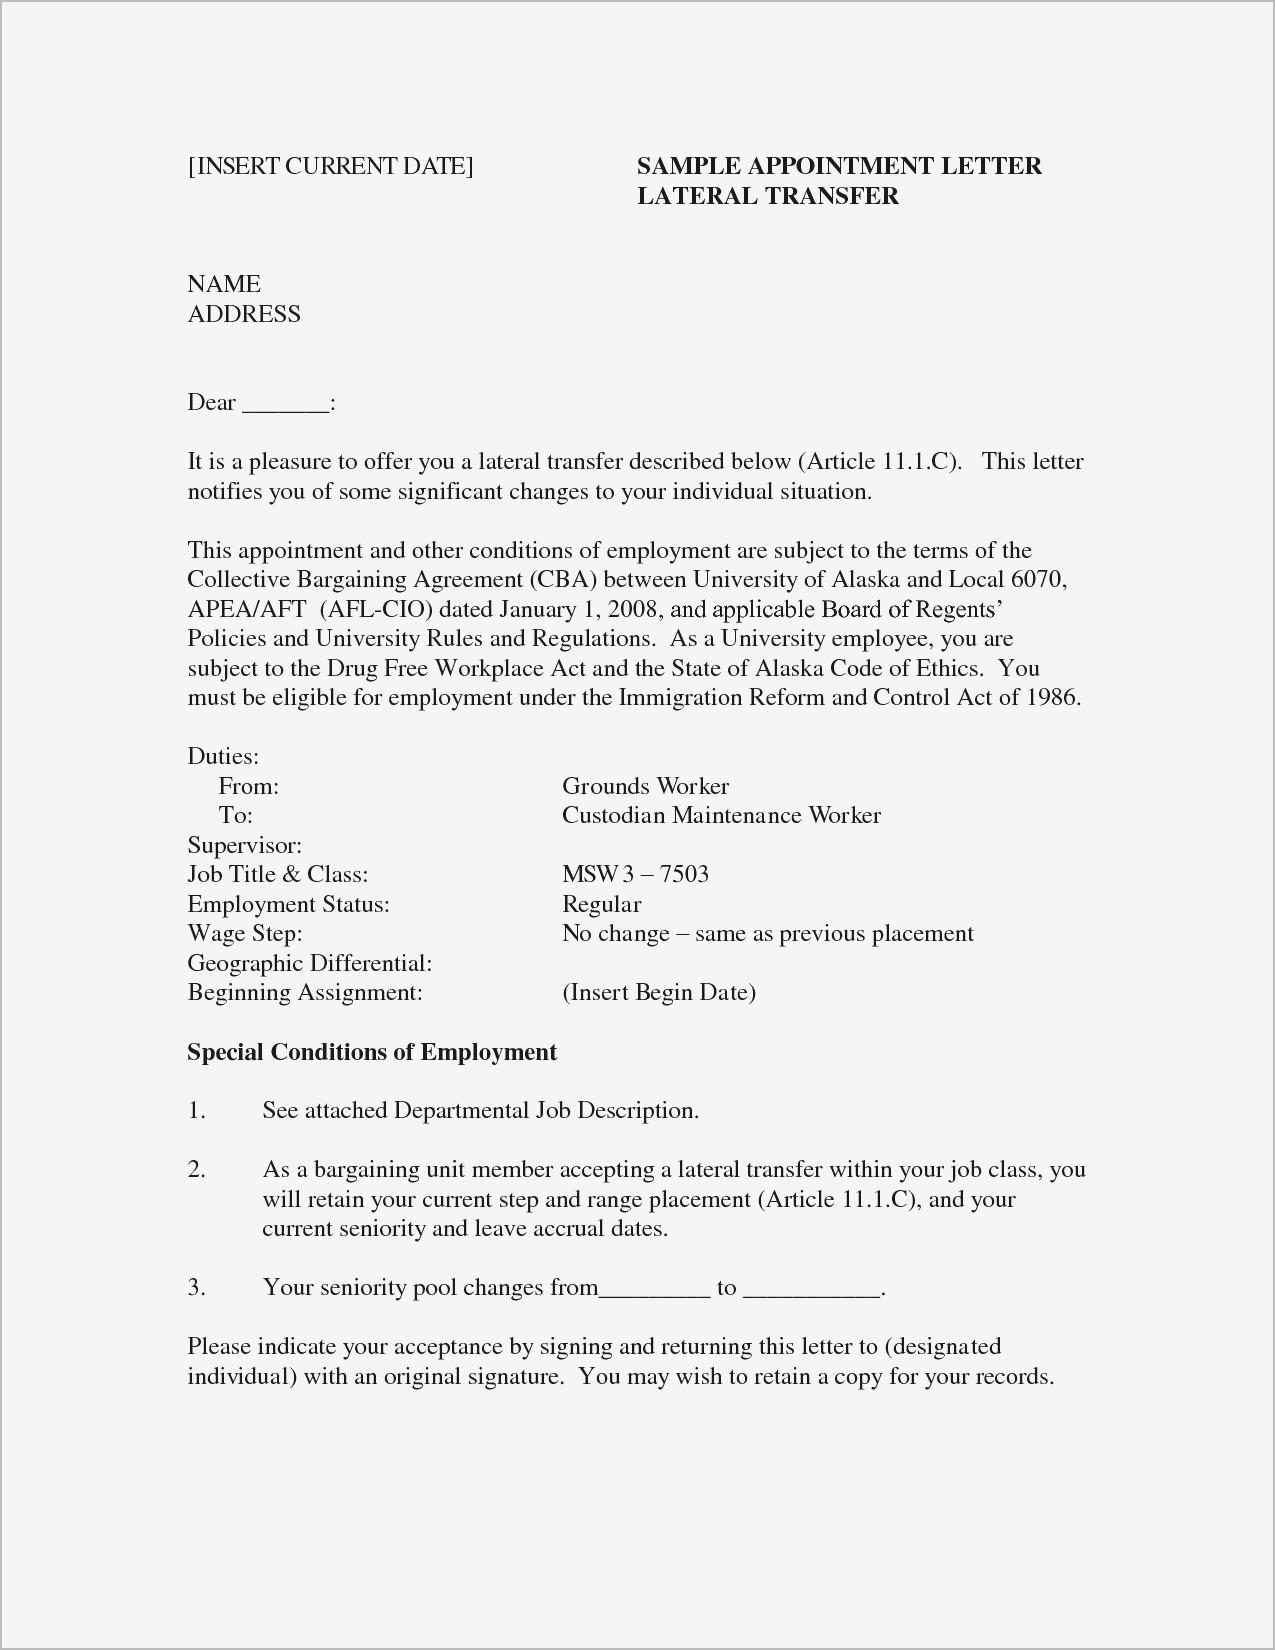 Business Cover Letter Template Download - Unique Cover Letters Pdf format